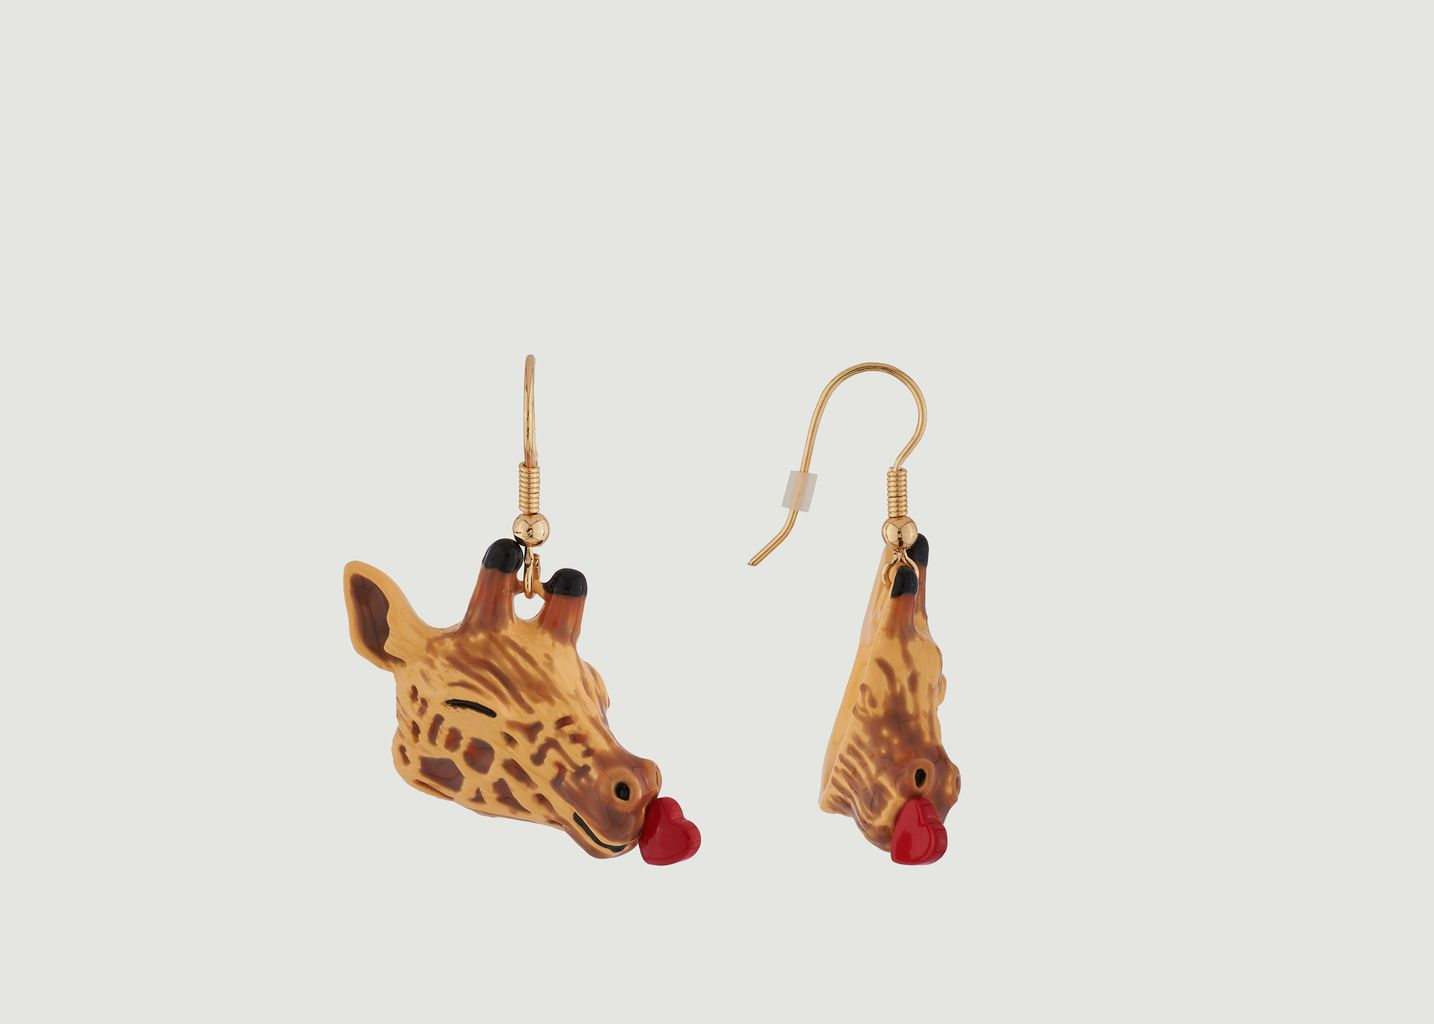 Boucles d'Oreilles Girafe Pleine d'Amour - N2